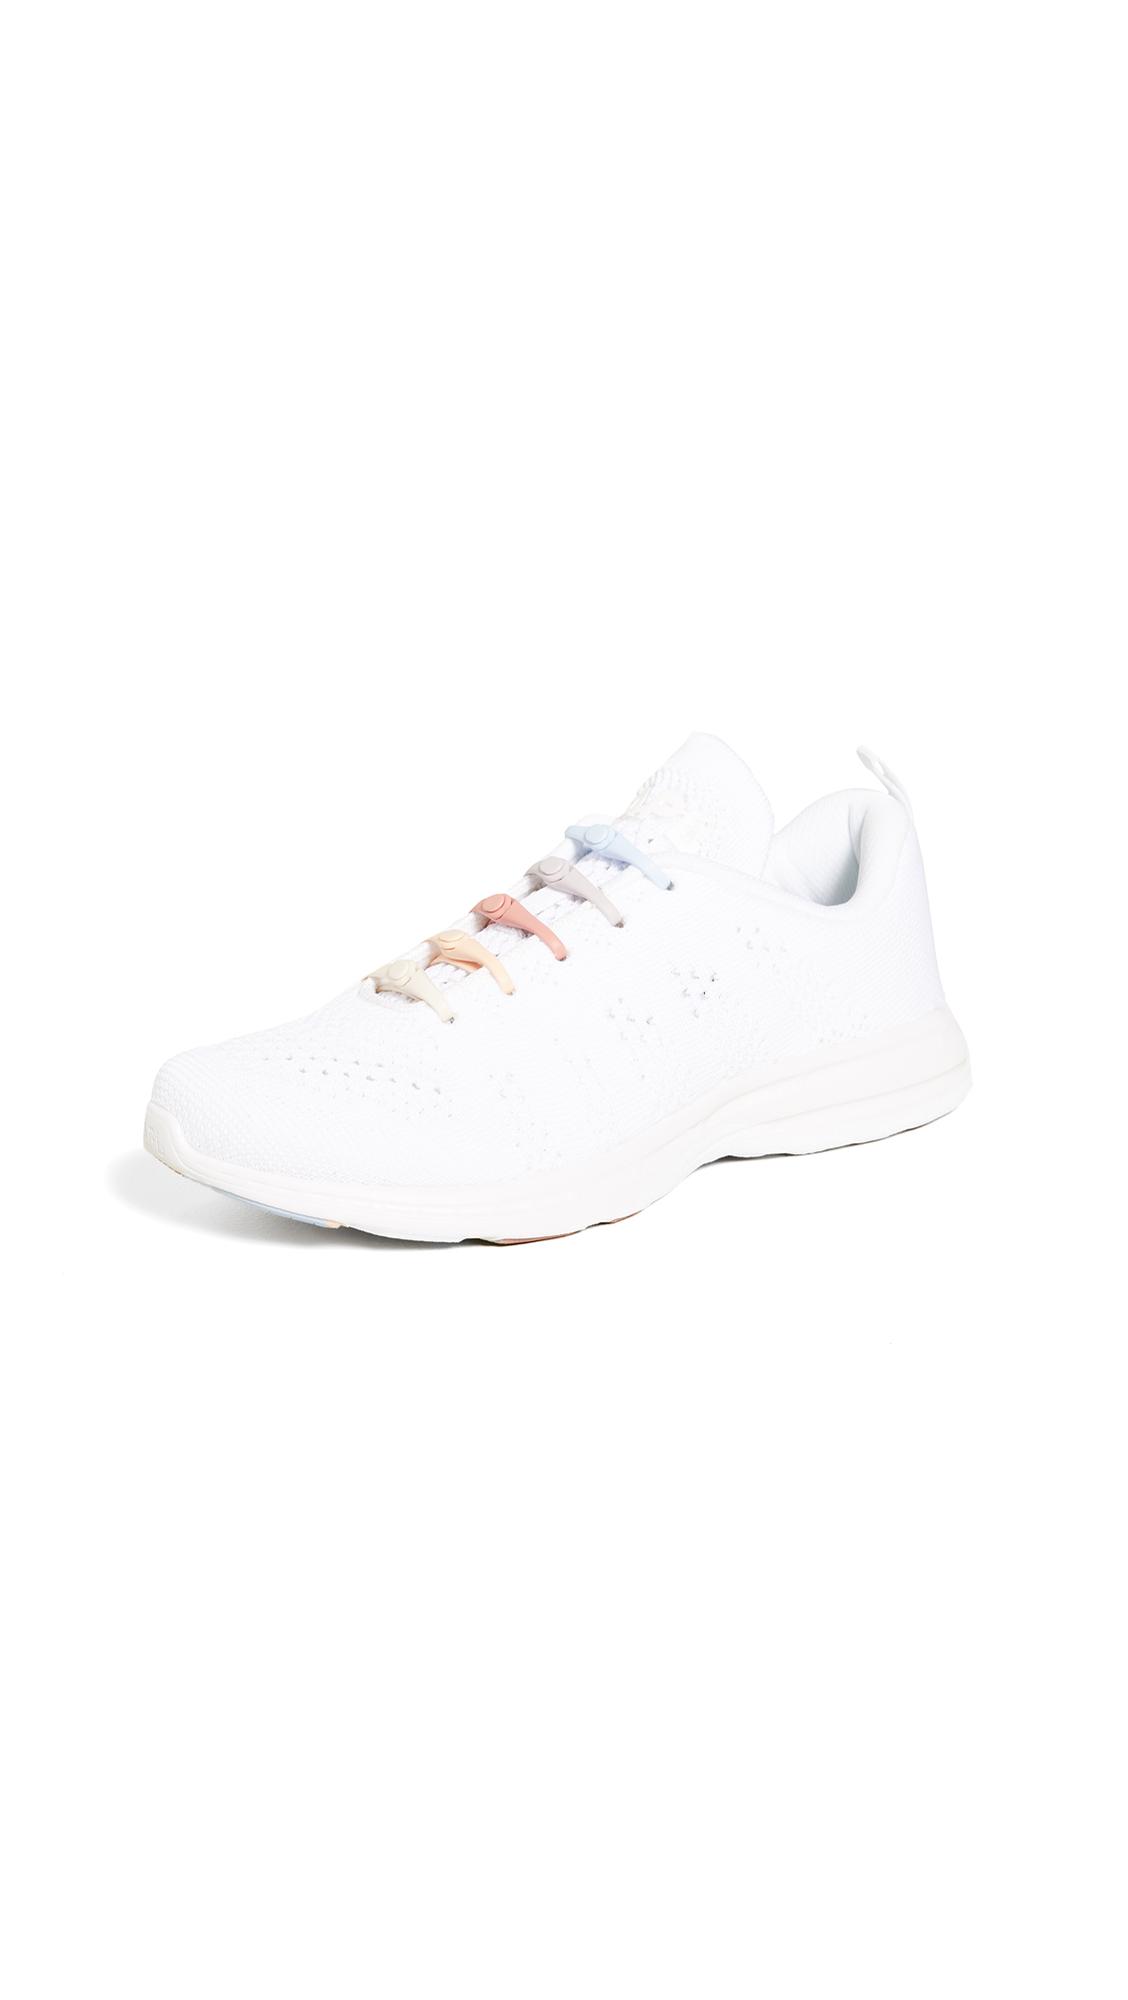 Buy APL: Athletic Propulsion Labs online - photo of APL: Athletic Propulsion Labs TechLoom Pro Sneakers